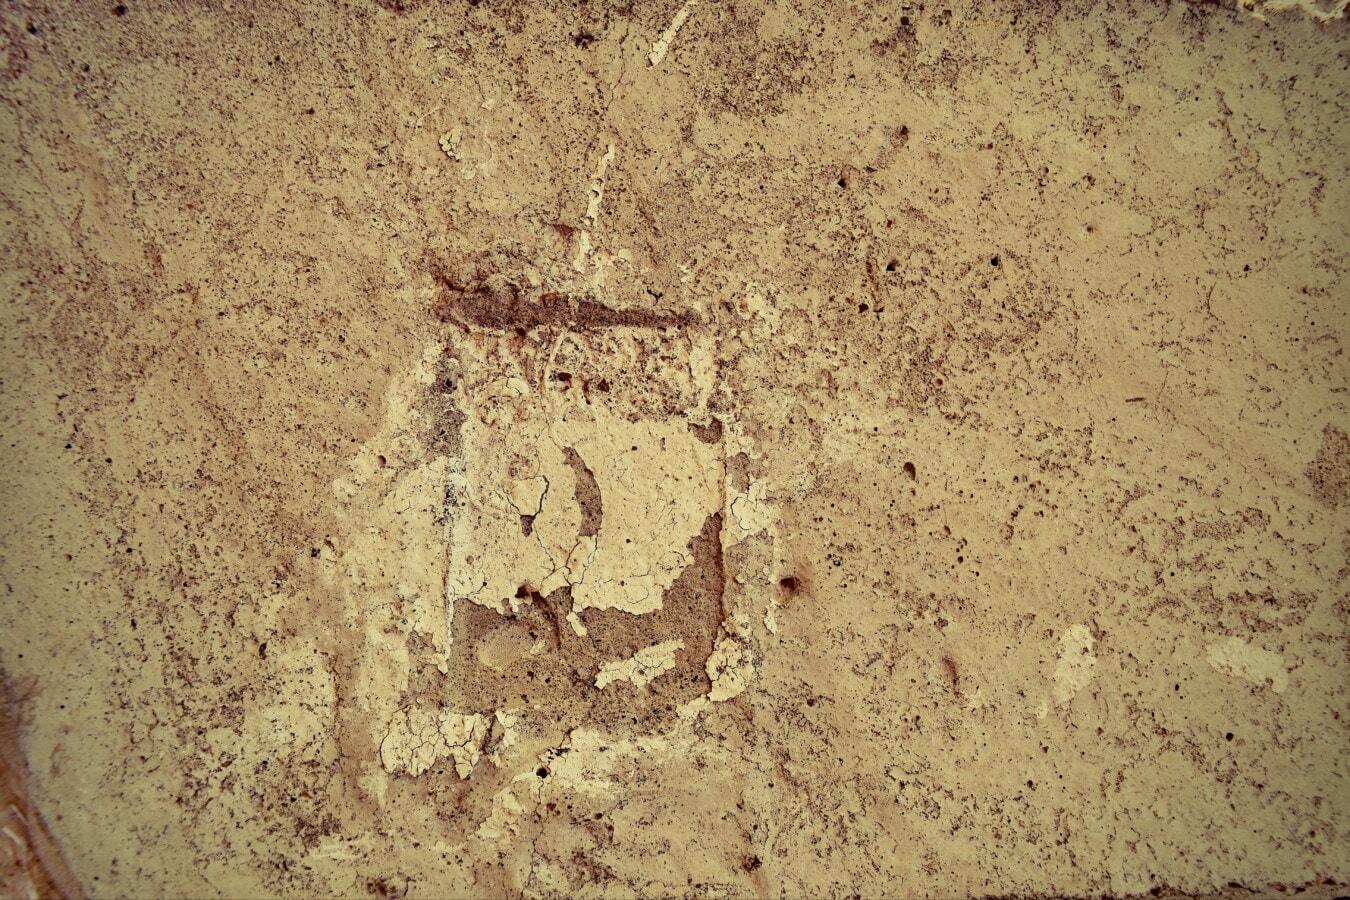 Beton, alt, Textur, Retro, dreckig, rau, Sand, Antik, Jahrgang, abstrakt